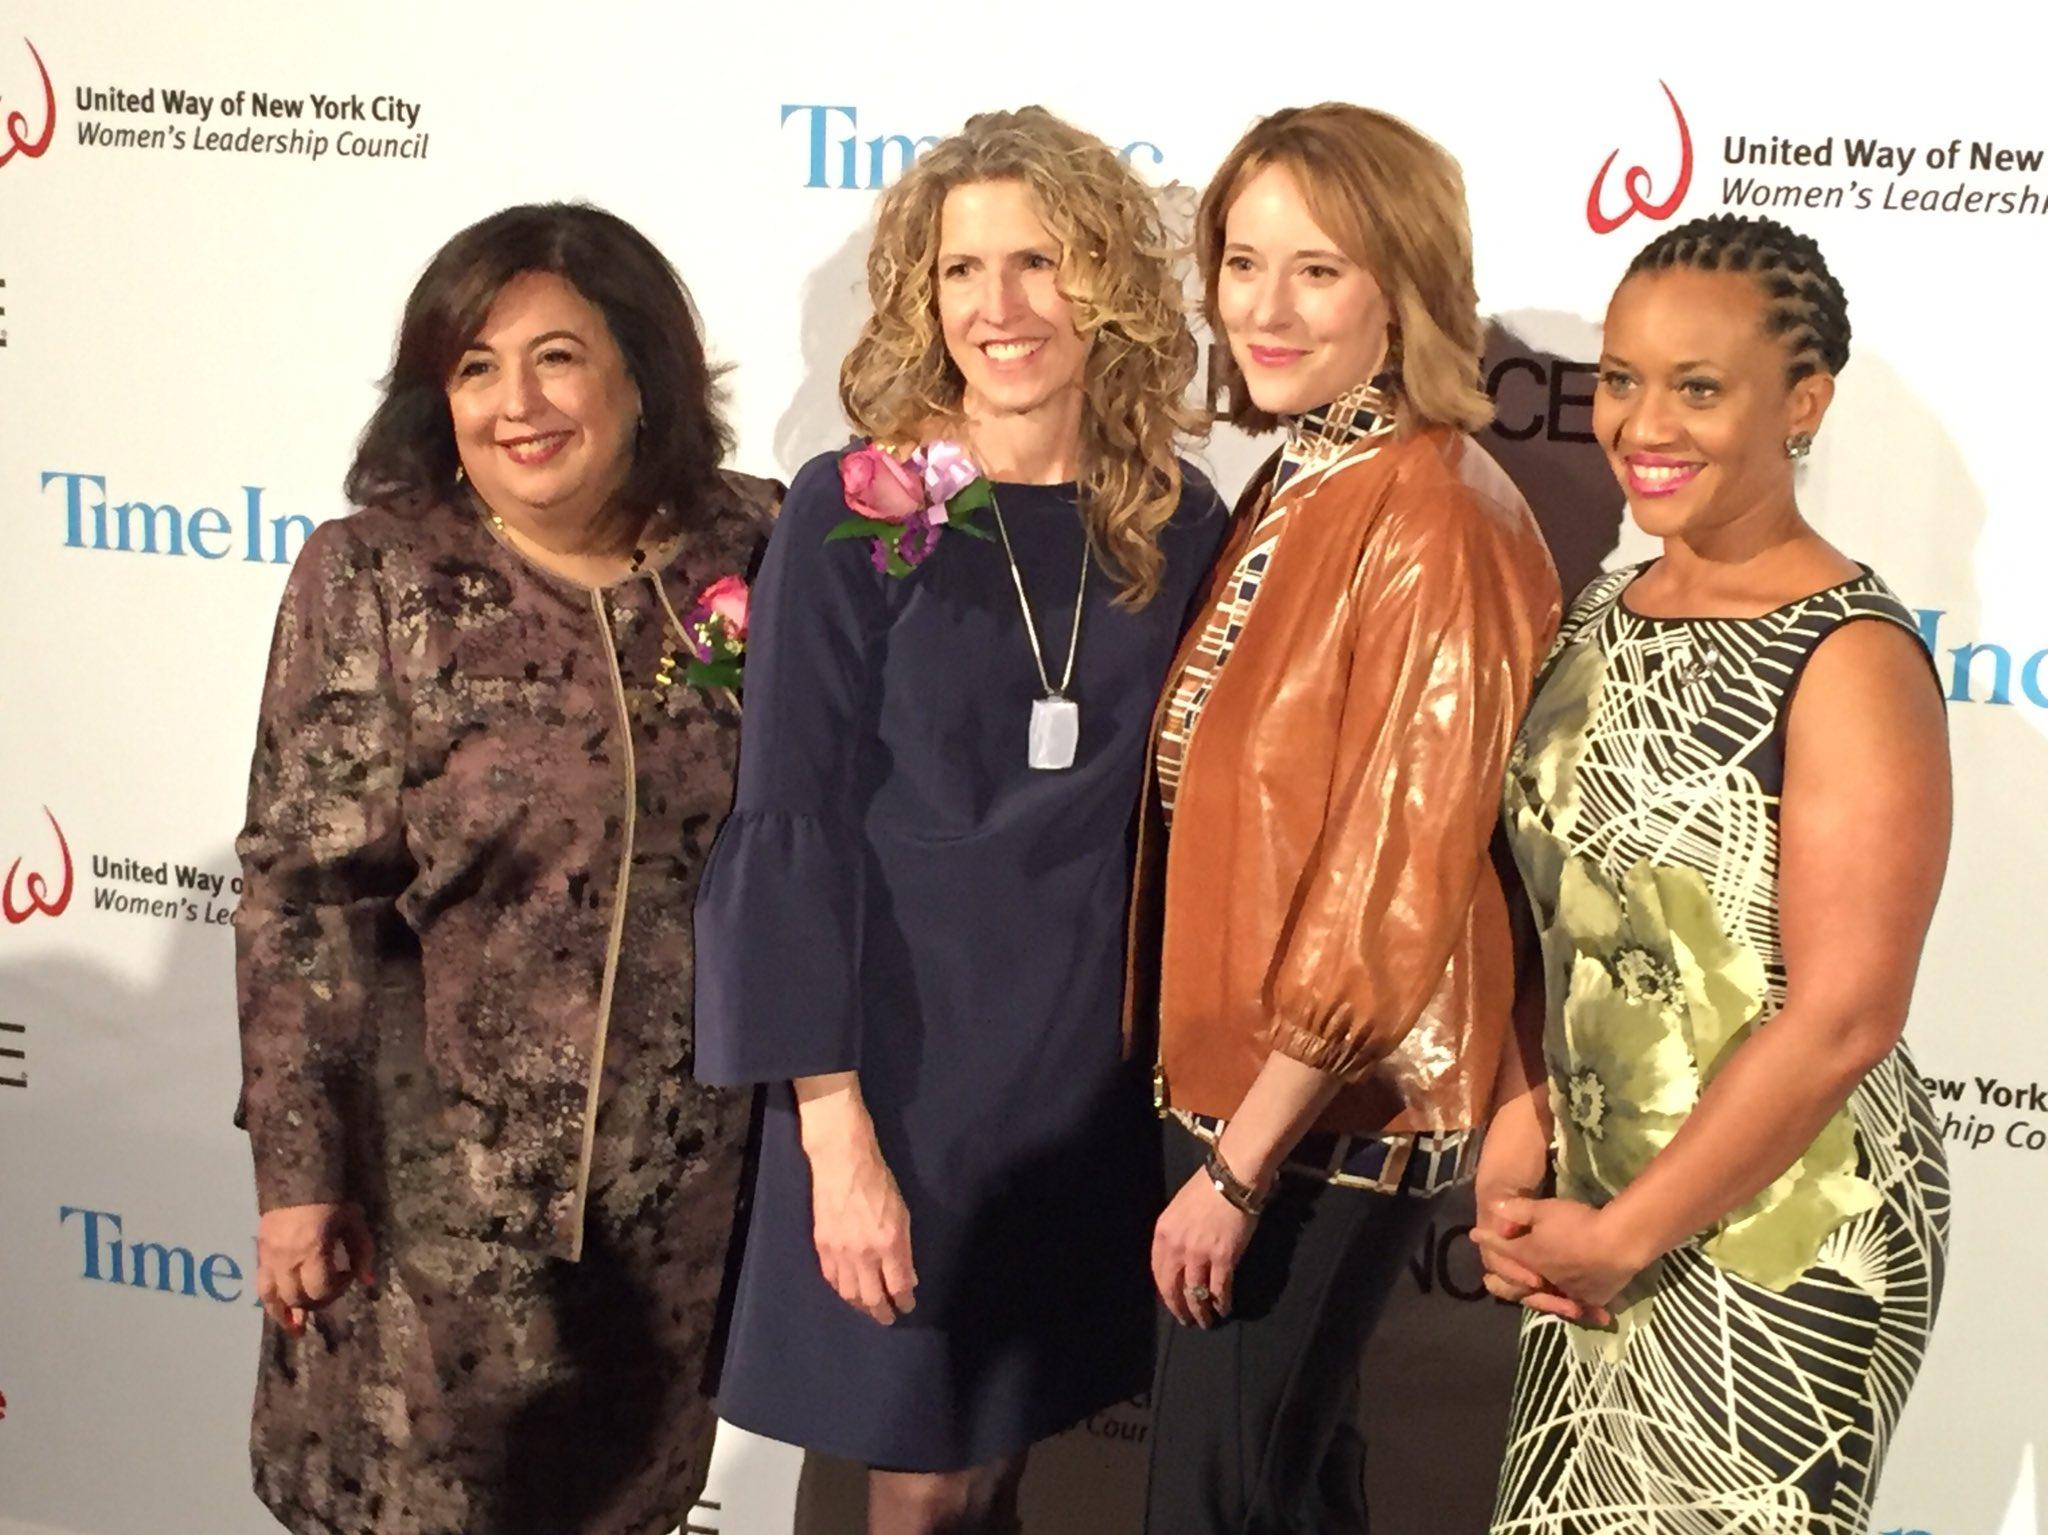 Can't wait to celebrate our 2017 #PowerofWomen honorees: Maroa Velez, Kriss Deiglmeier, & Jacki Kelley, here with @SheenaWrightNYC! https://t.co/LTscmXIo99